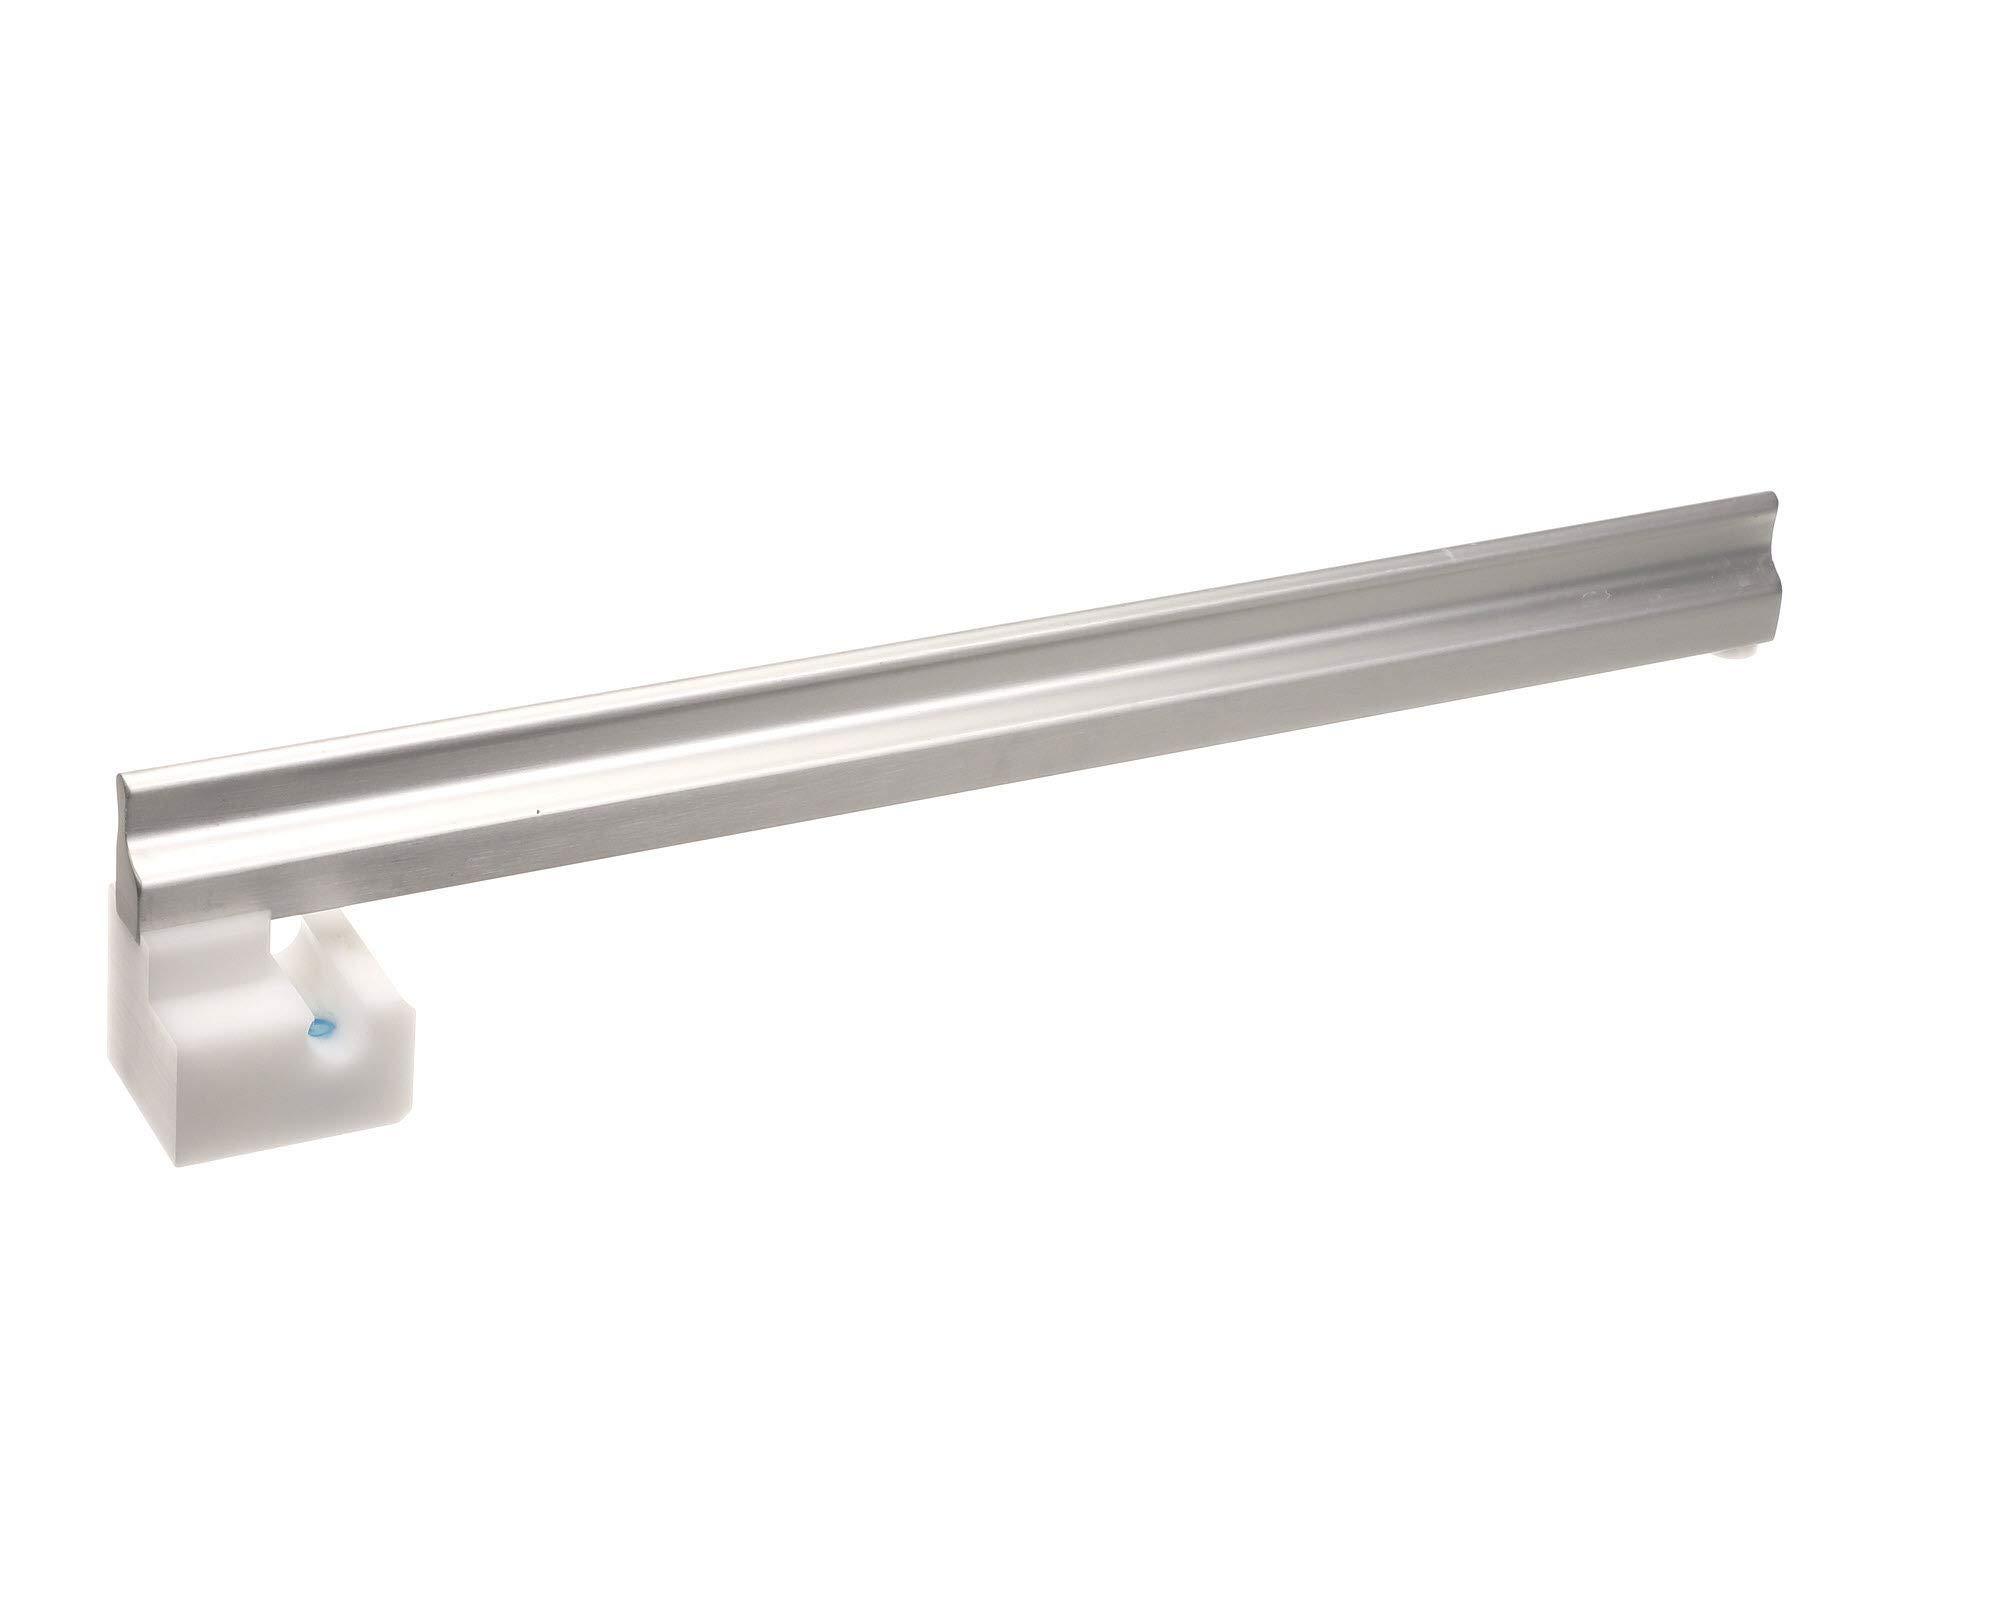 Bizerba S38011665000 Prod Fixation Ruler